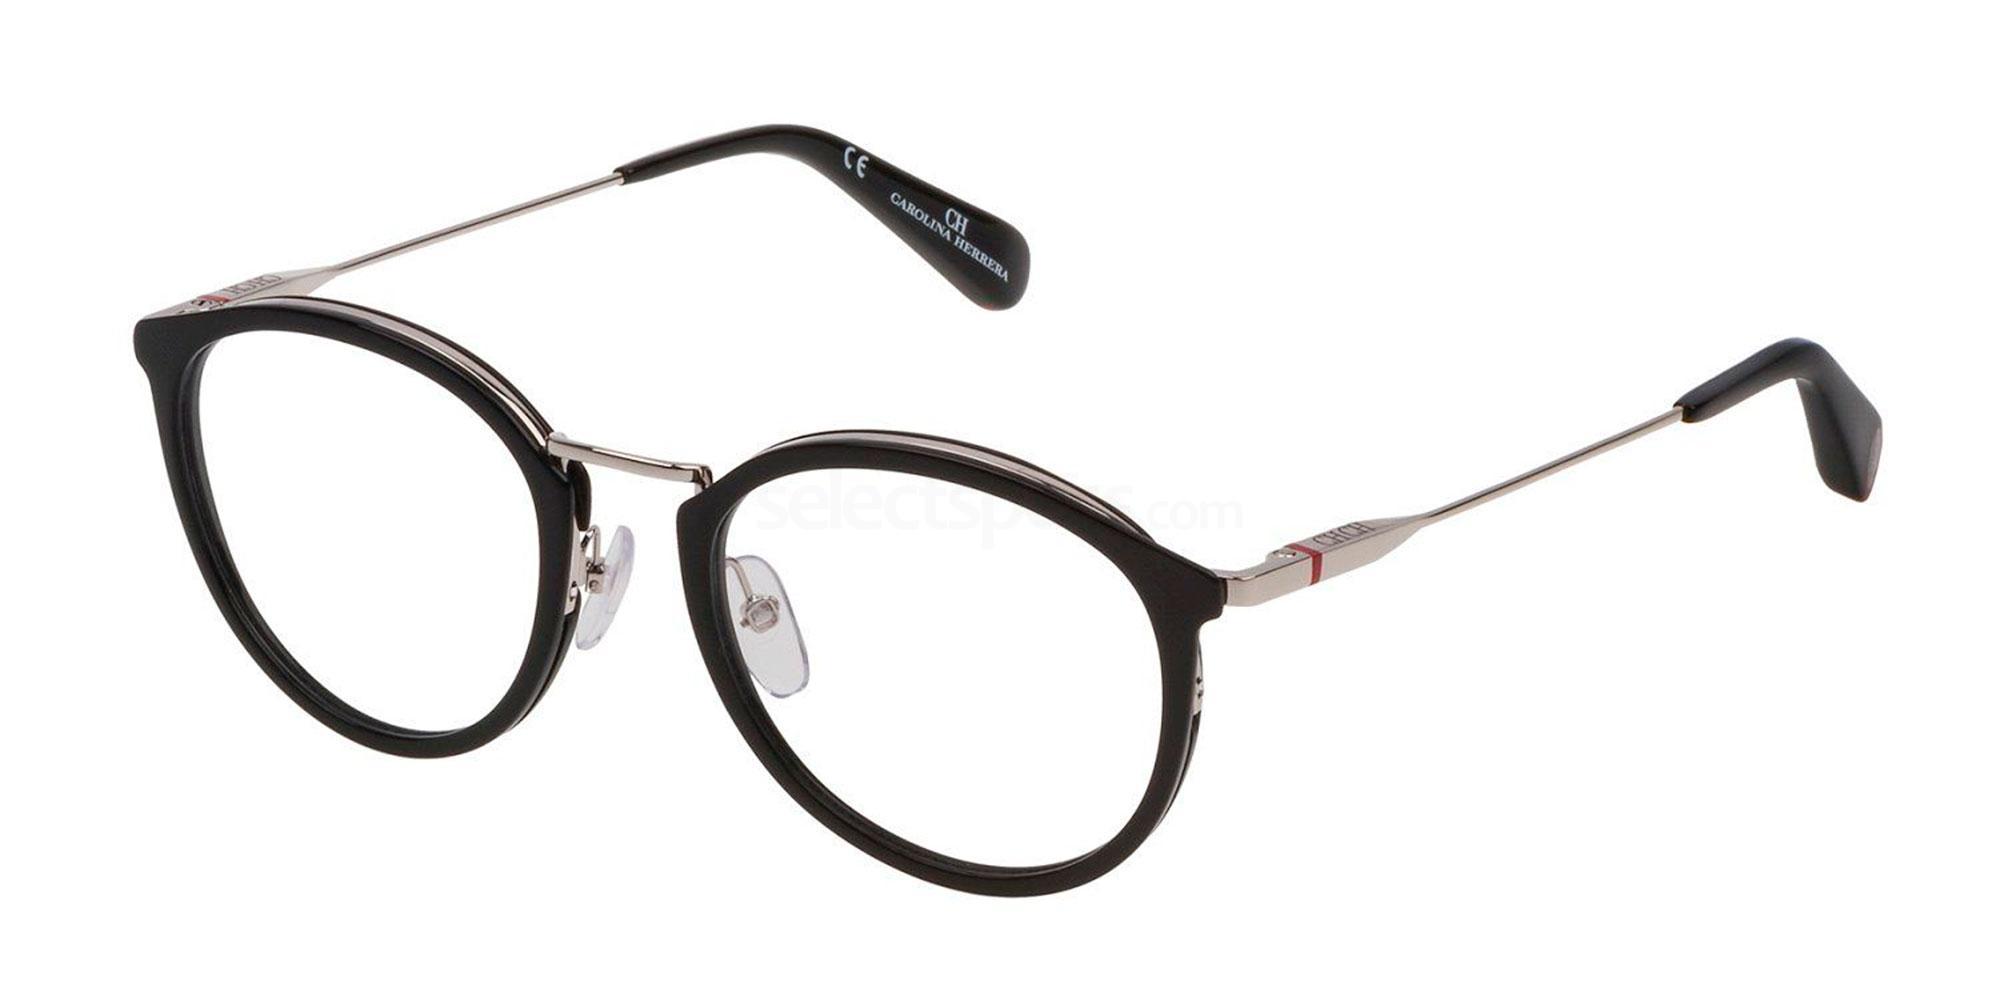 0700 VHE115 Glasses, CH Carolina Herrera